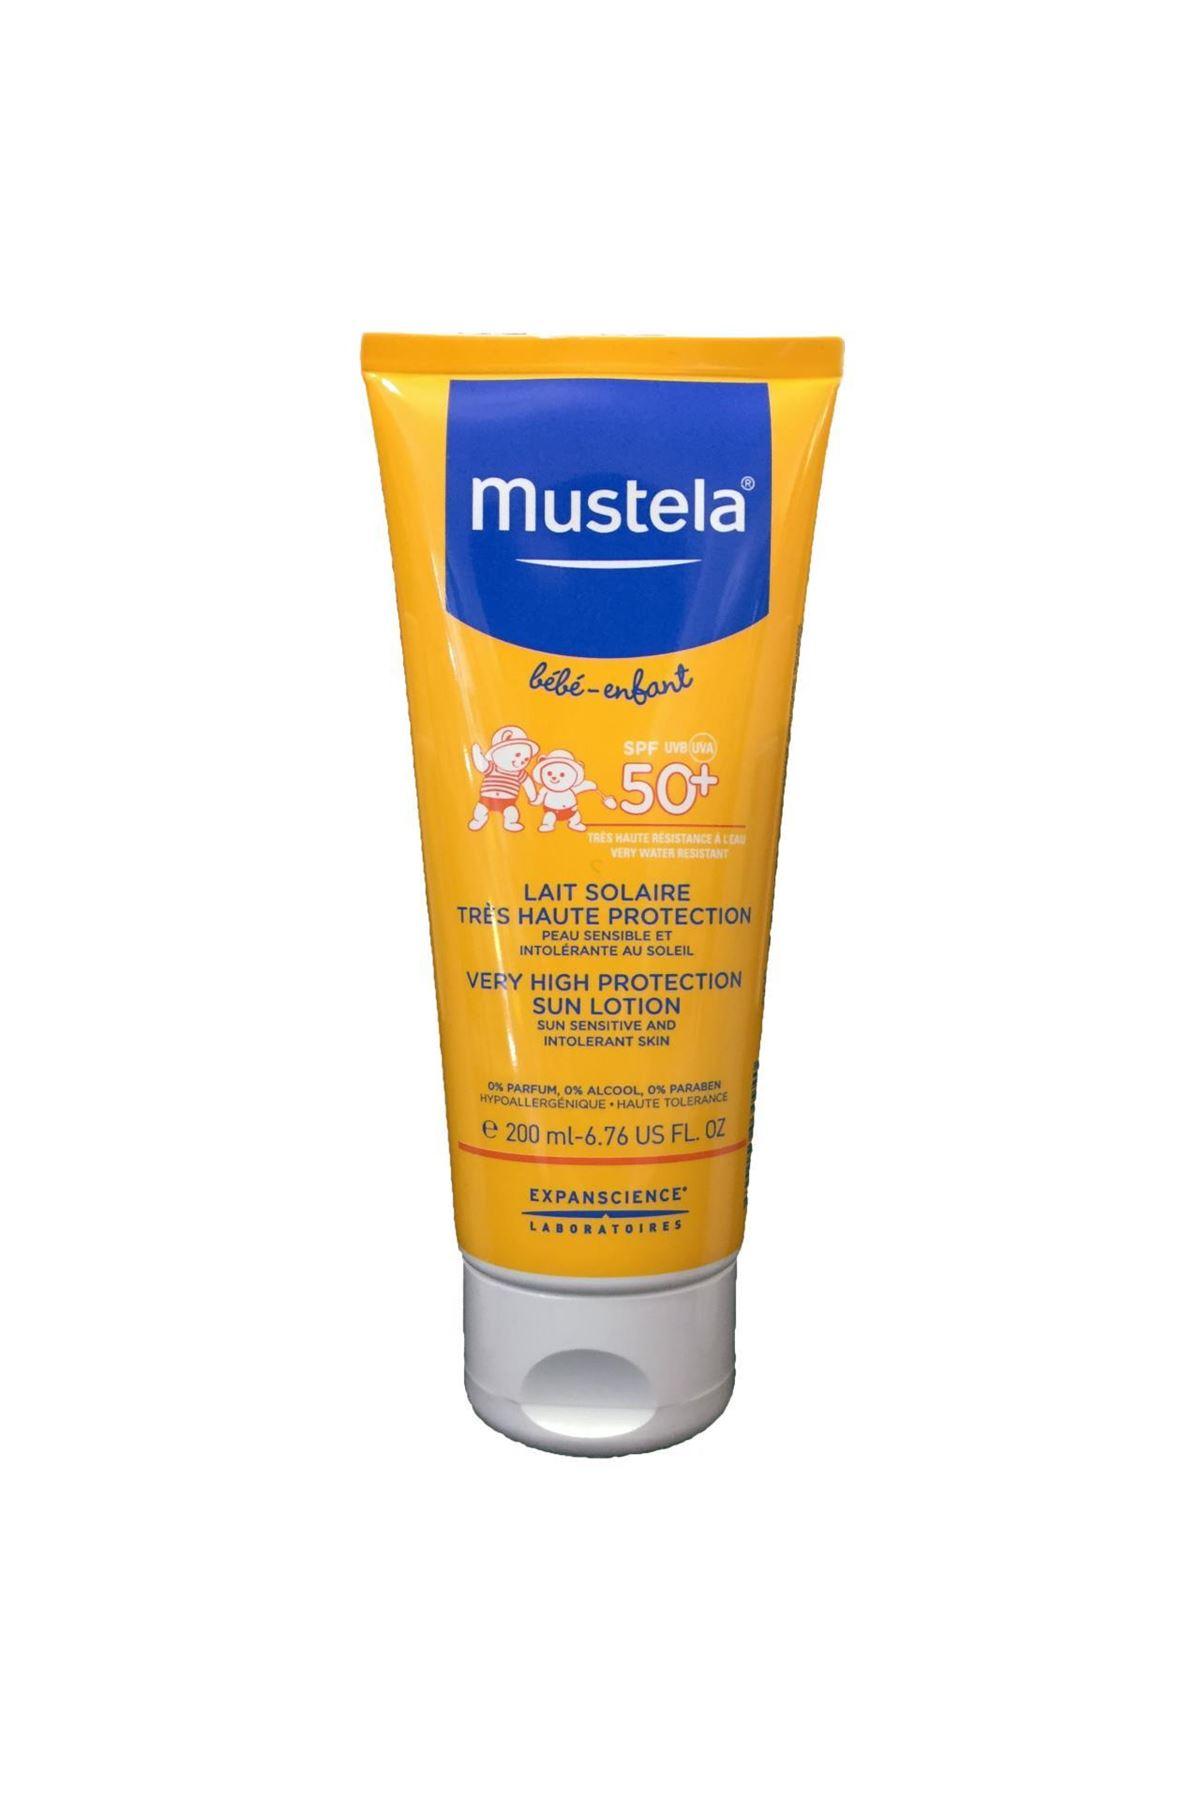 Mustela Very Higt Protection Güneş Losyonu 50 SPF 200 ML